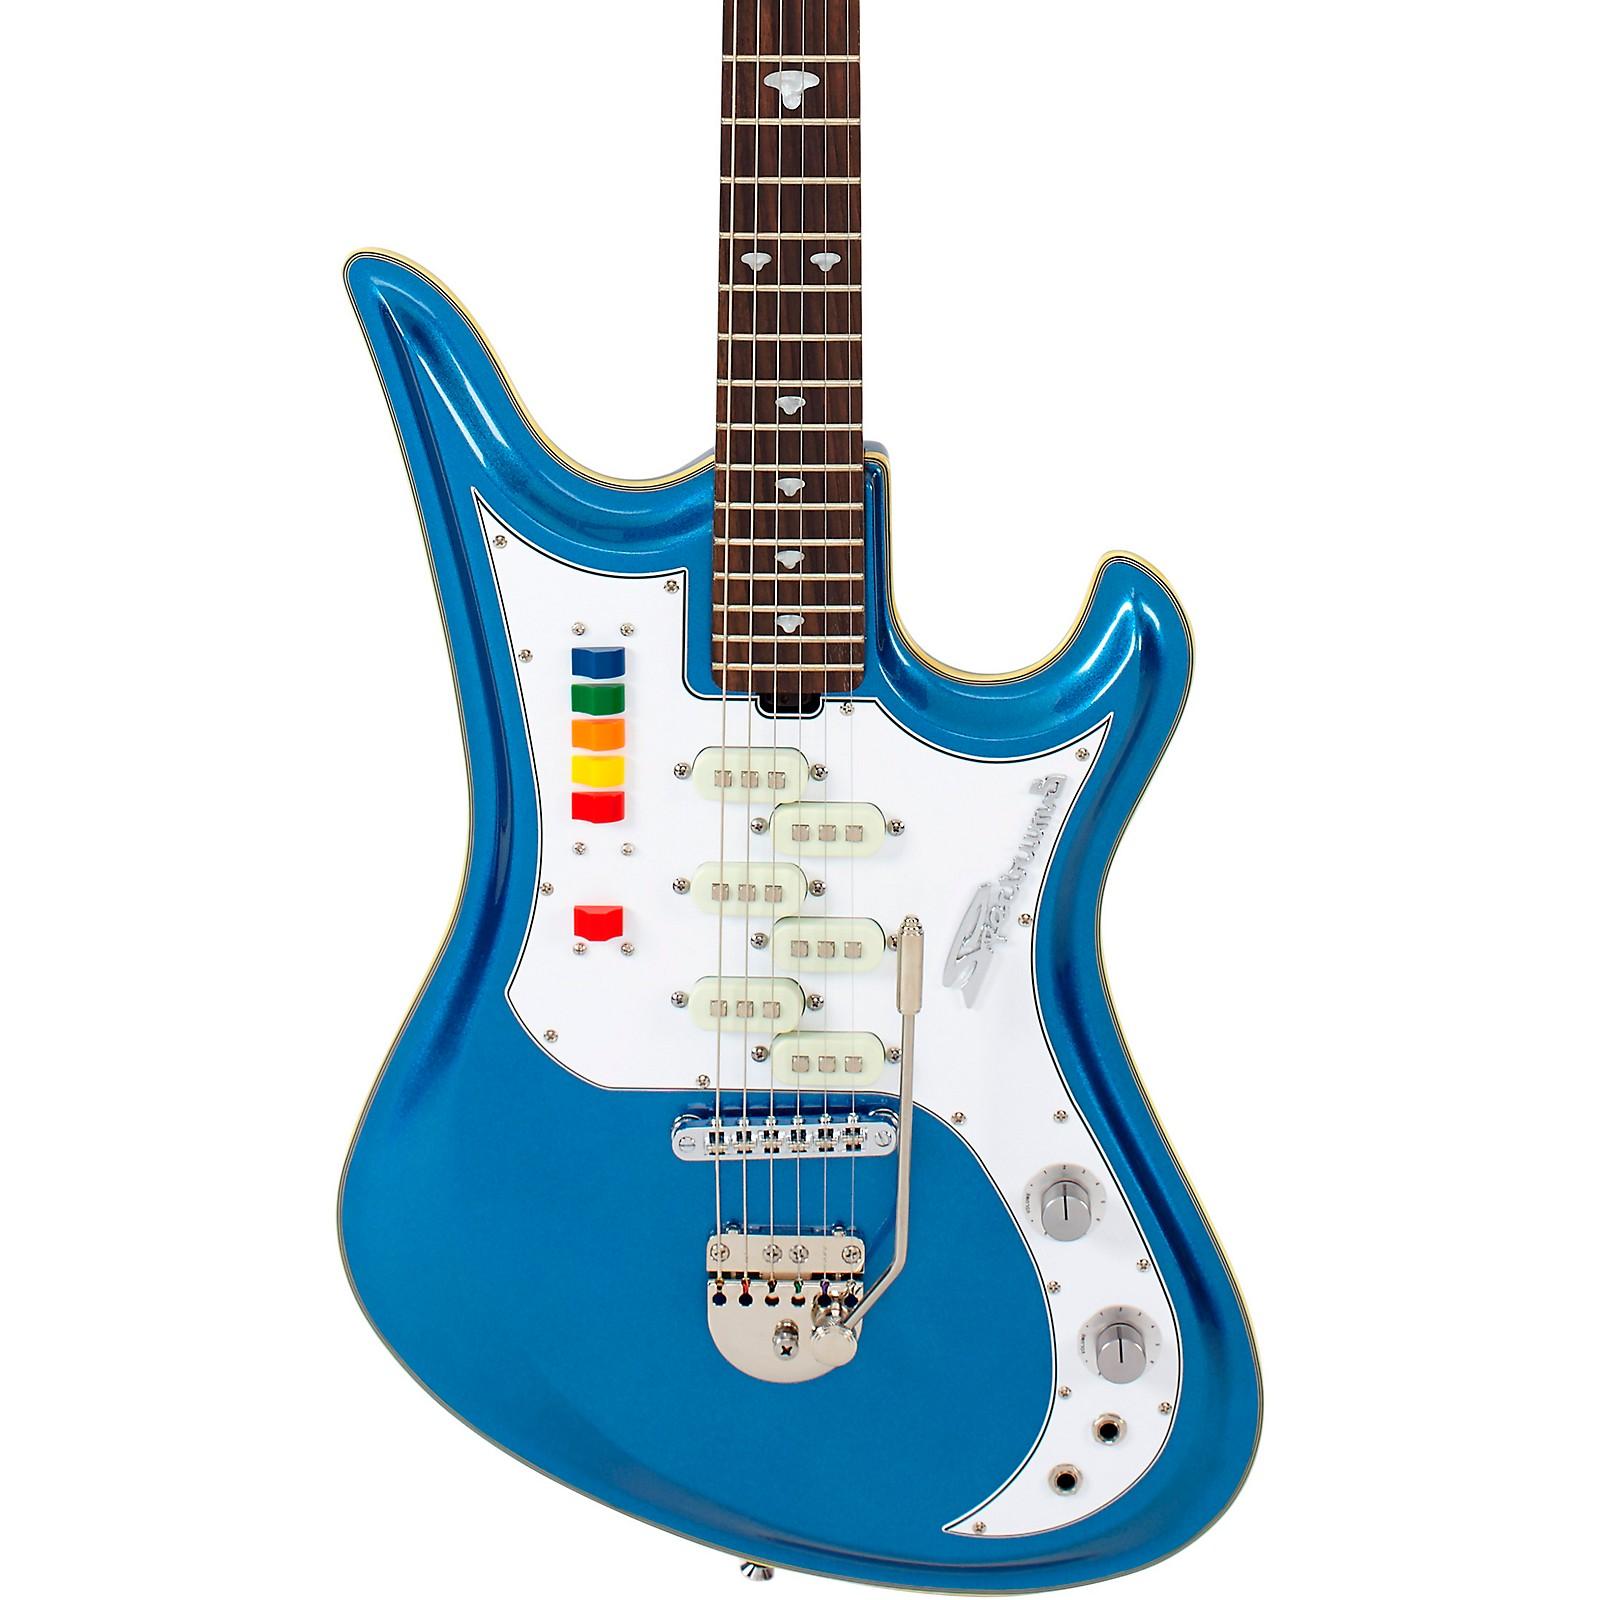 Eastwood Spectrum 5 Pro Electric Guitar